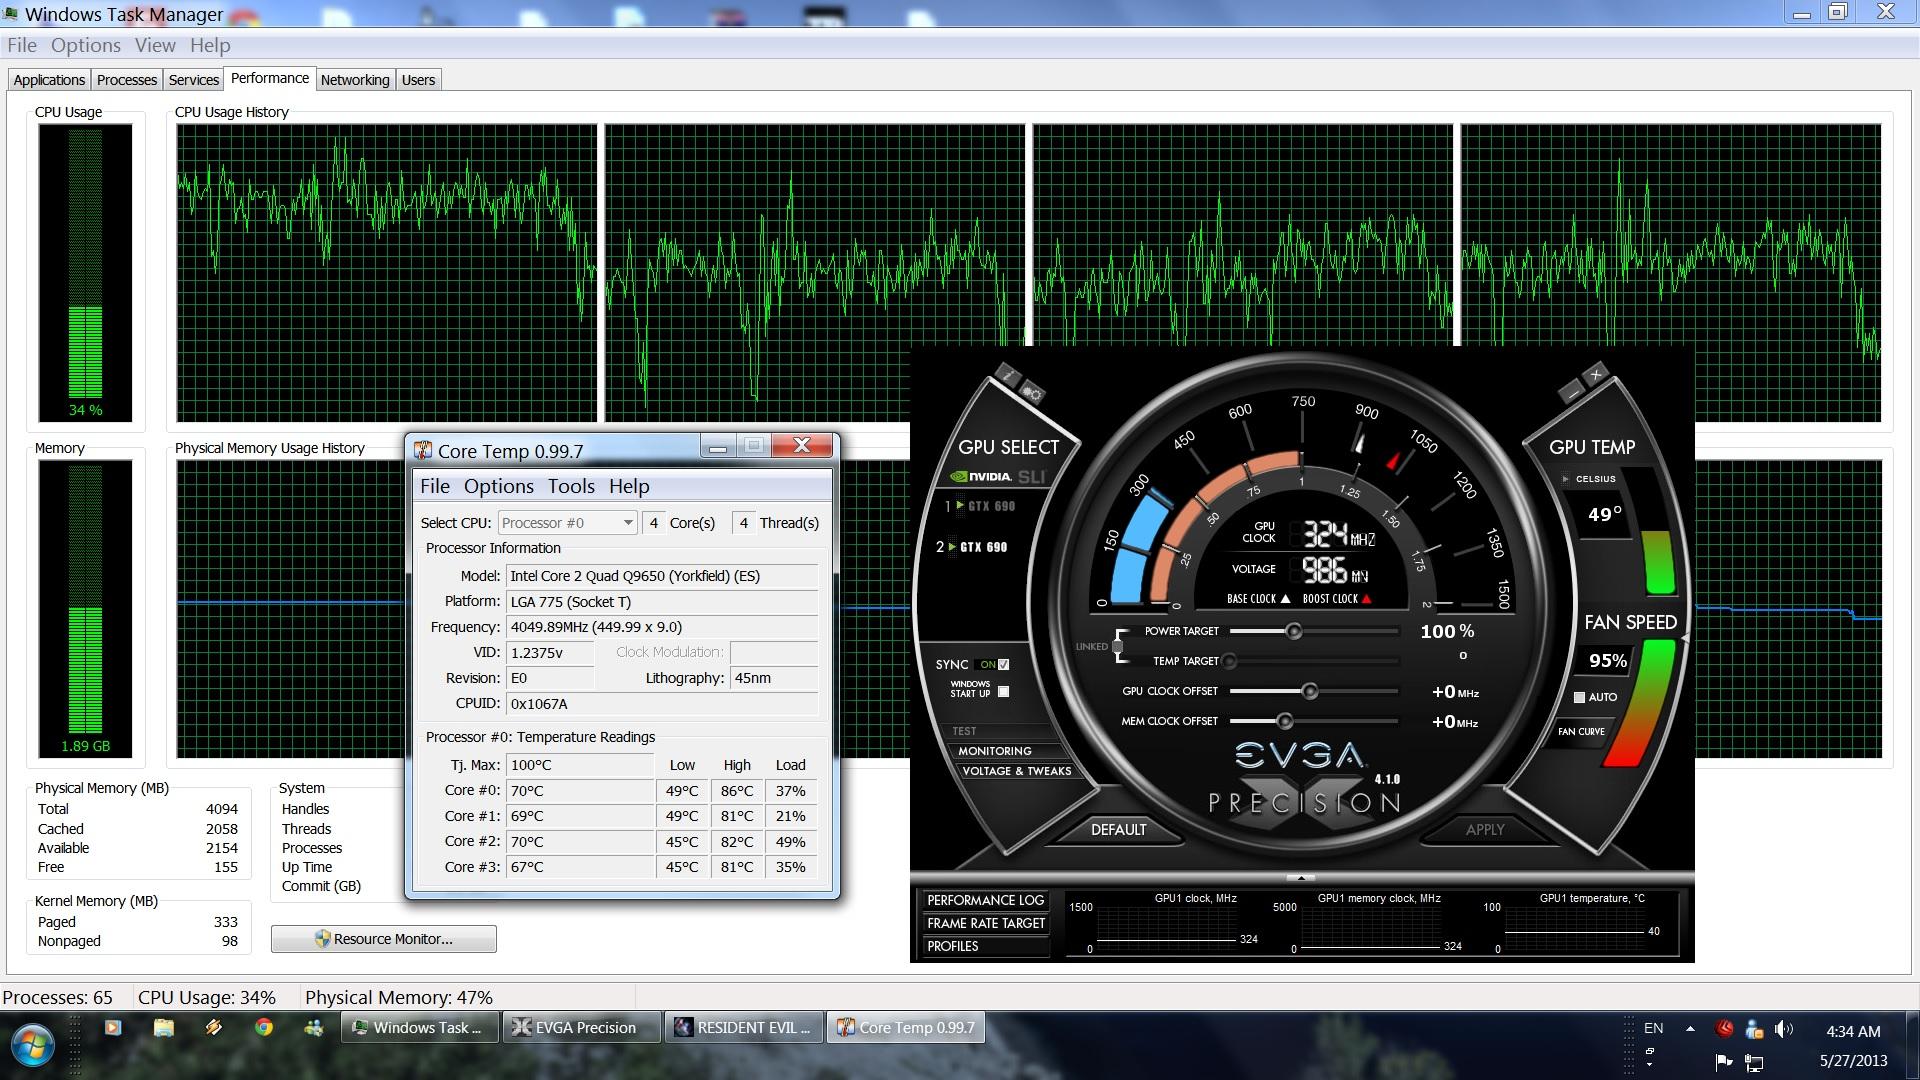 RE Revelations CPU Performance